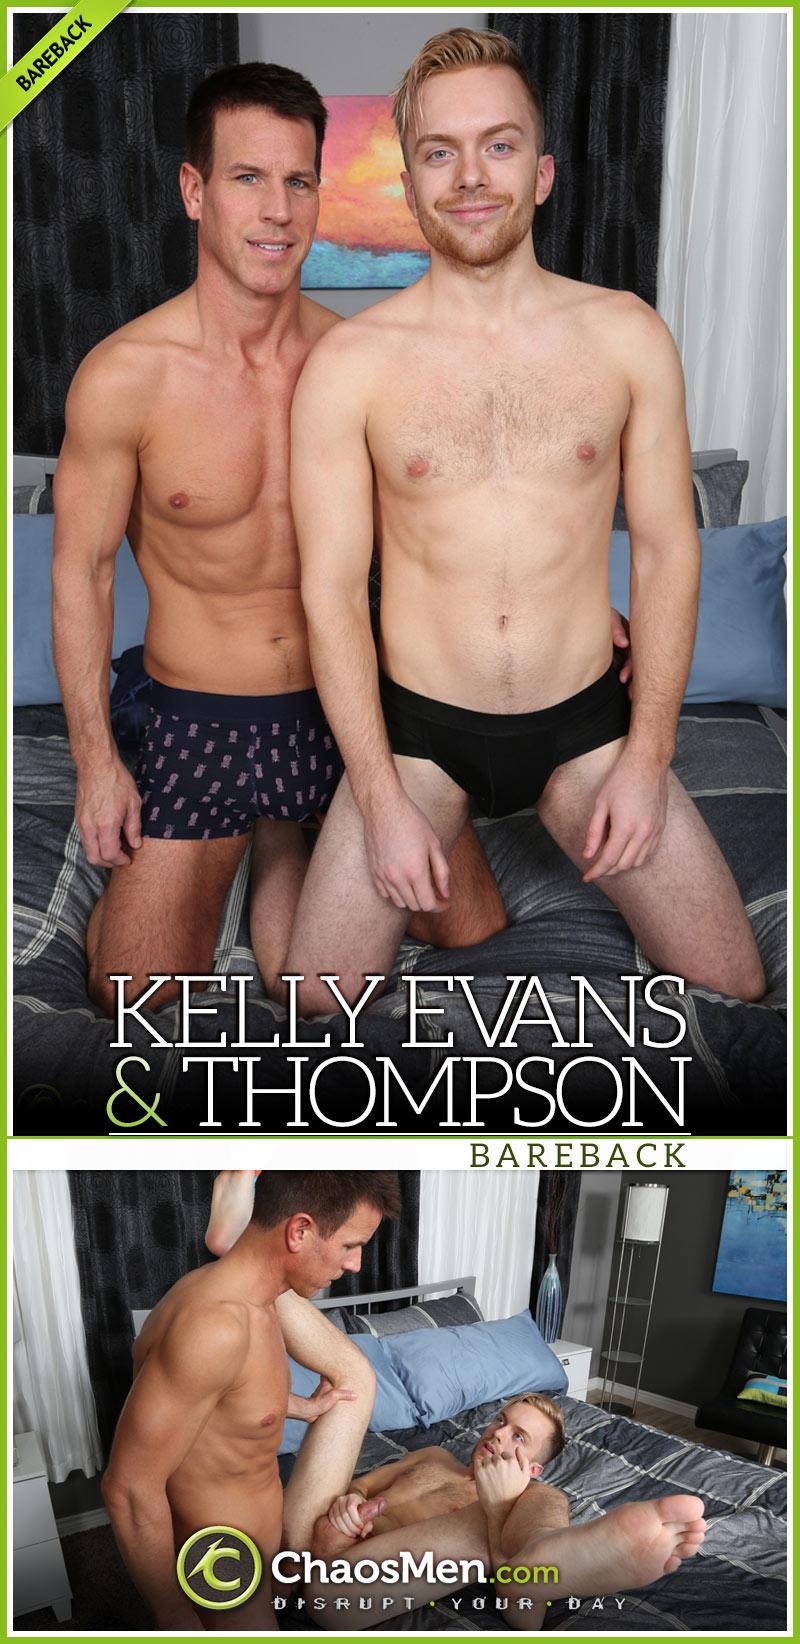 Kelly Evans Fucks Thompson at ChaosMen